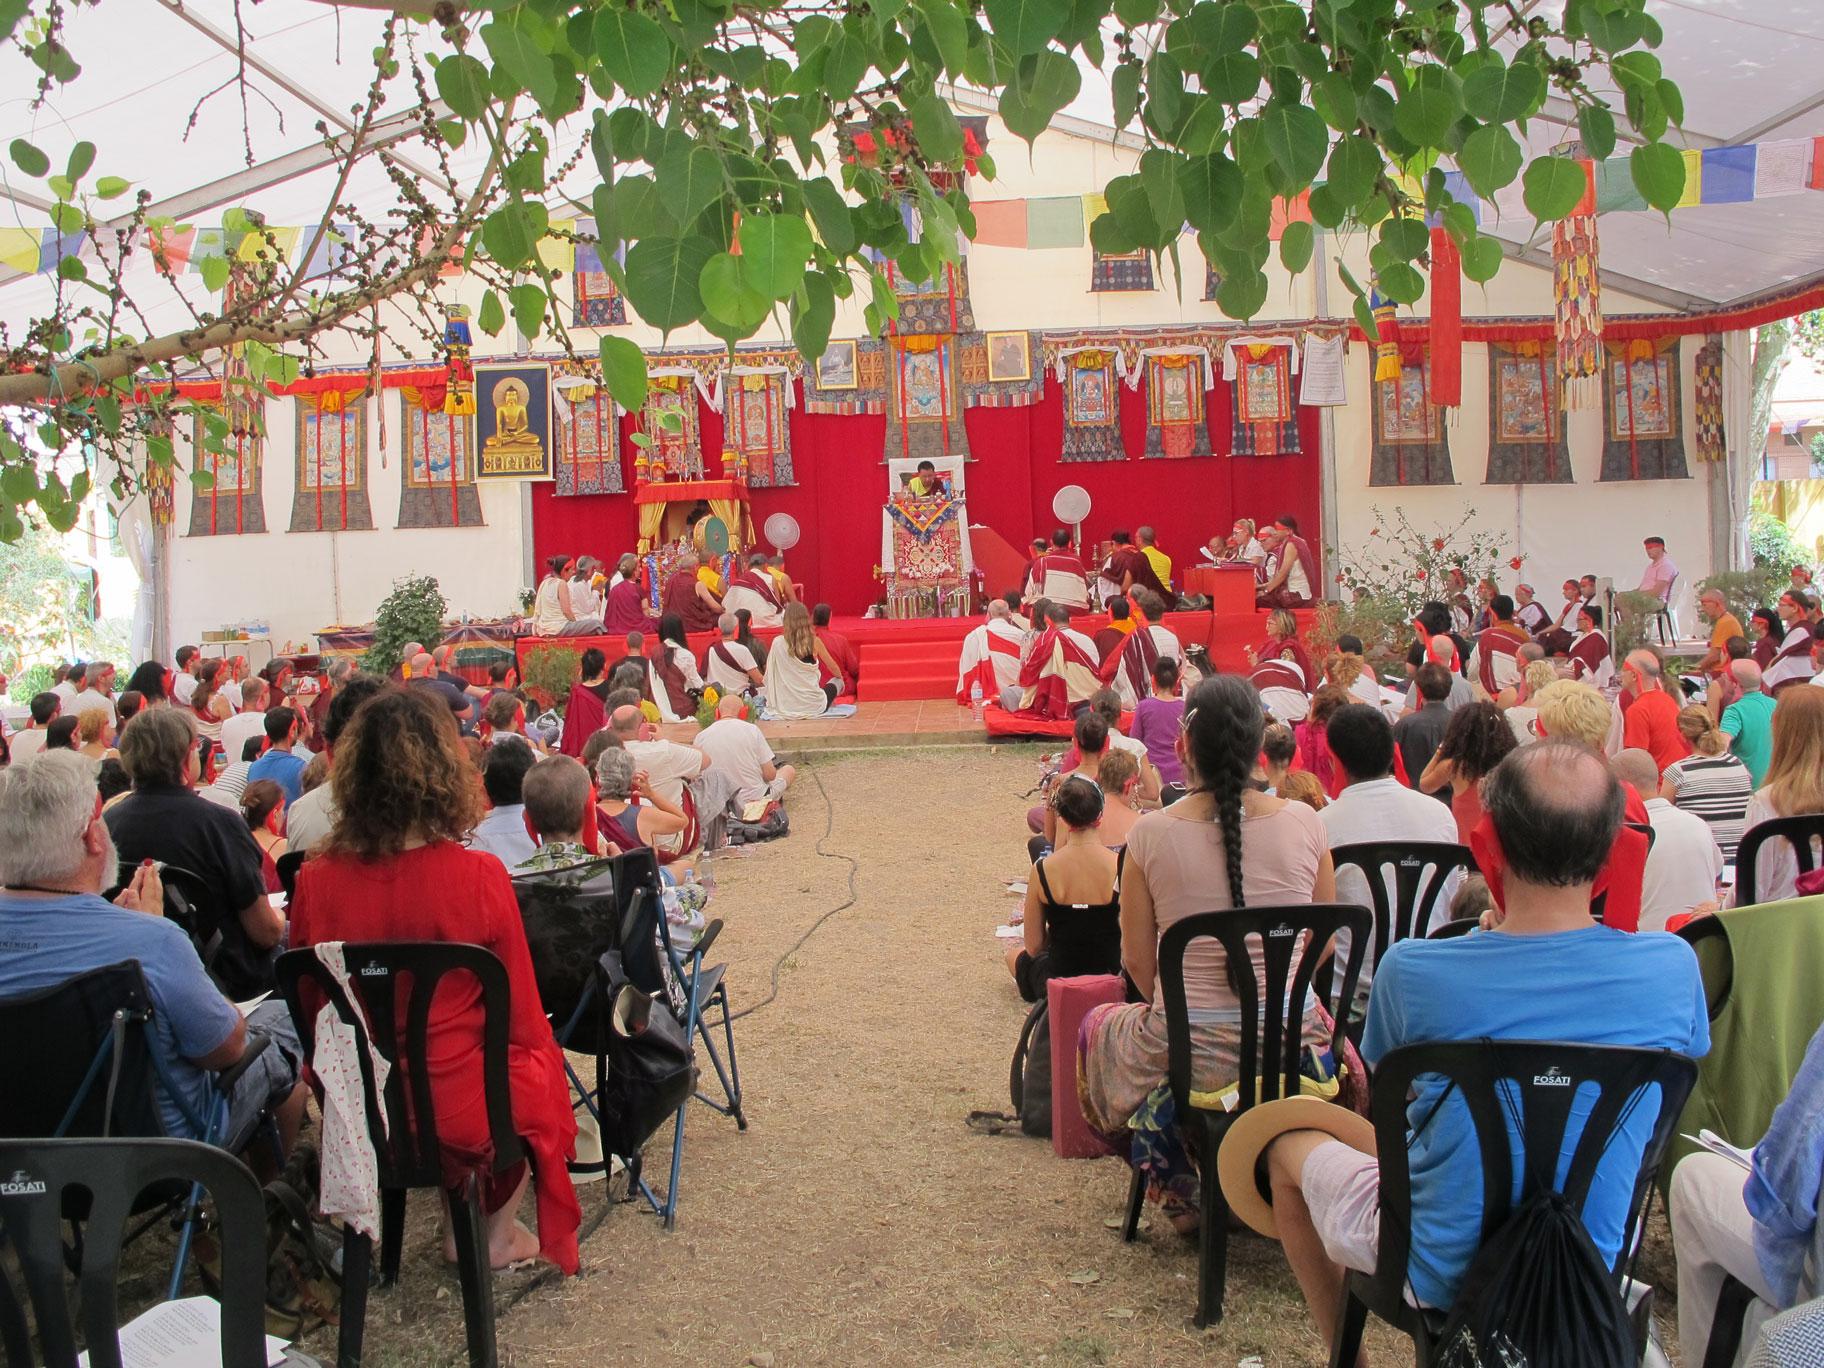 SS-Dudjom-Rinpoche-Sangye-Pema-Zhepa-evento-valencia-julio-2019-09